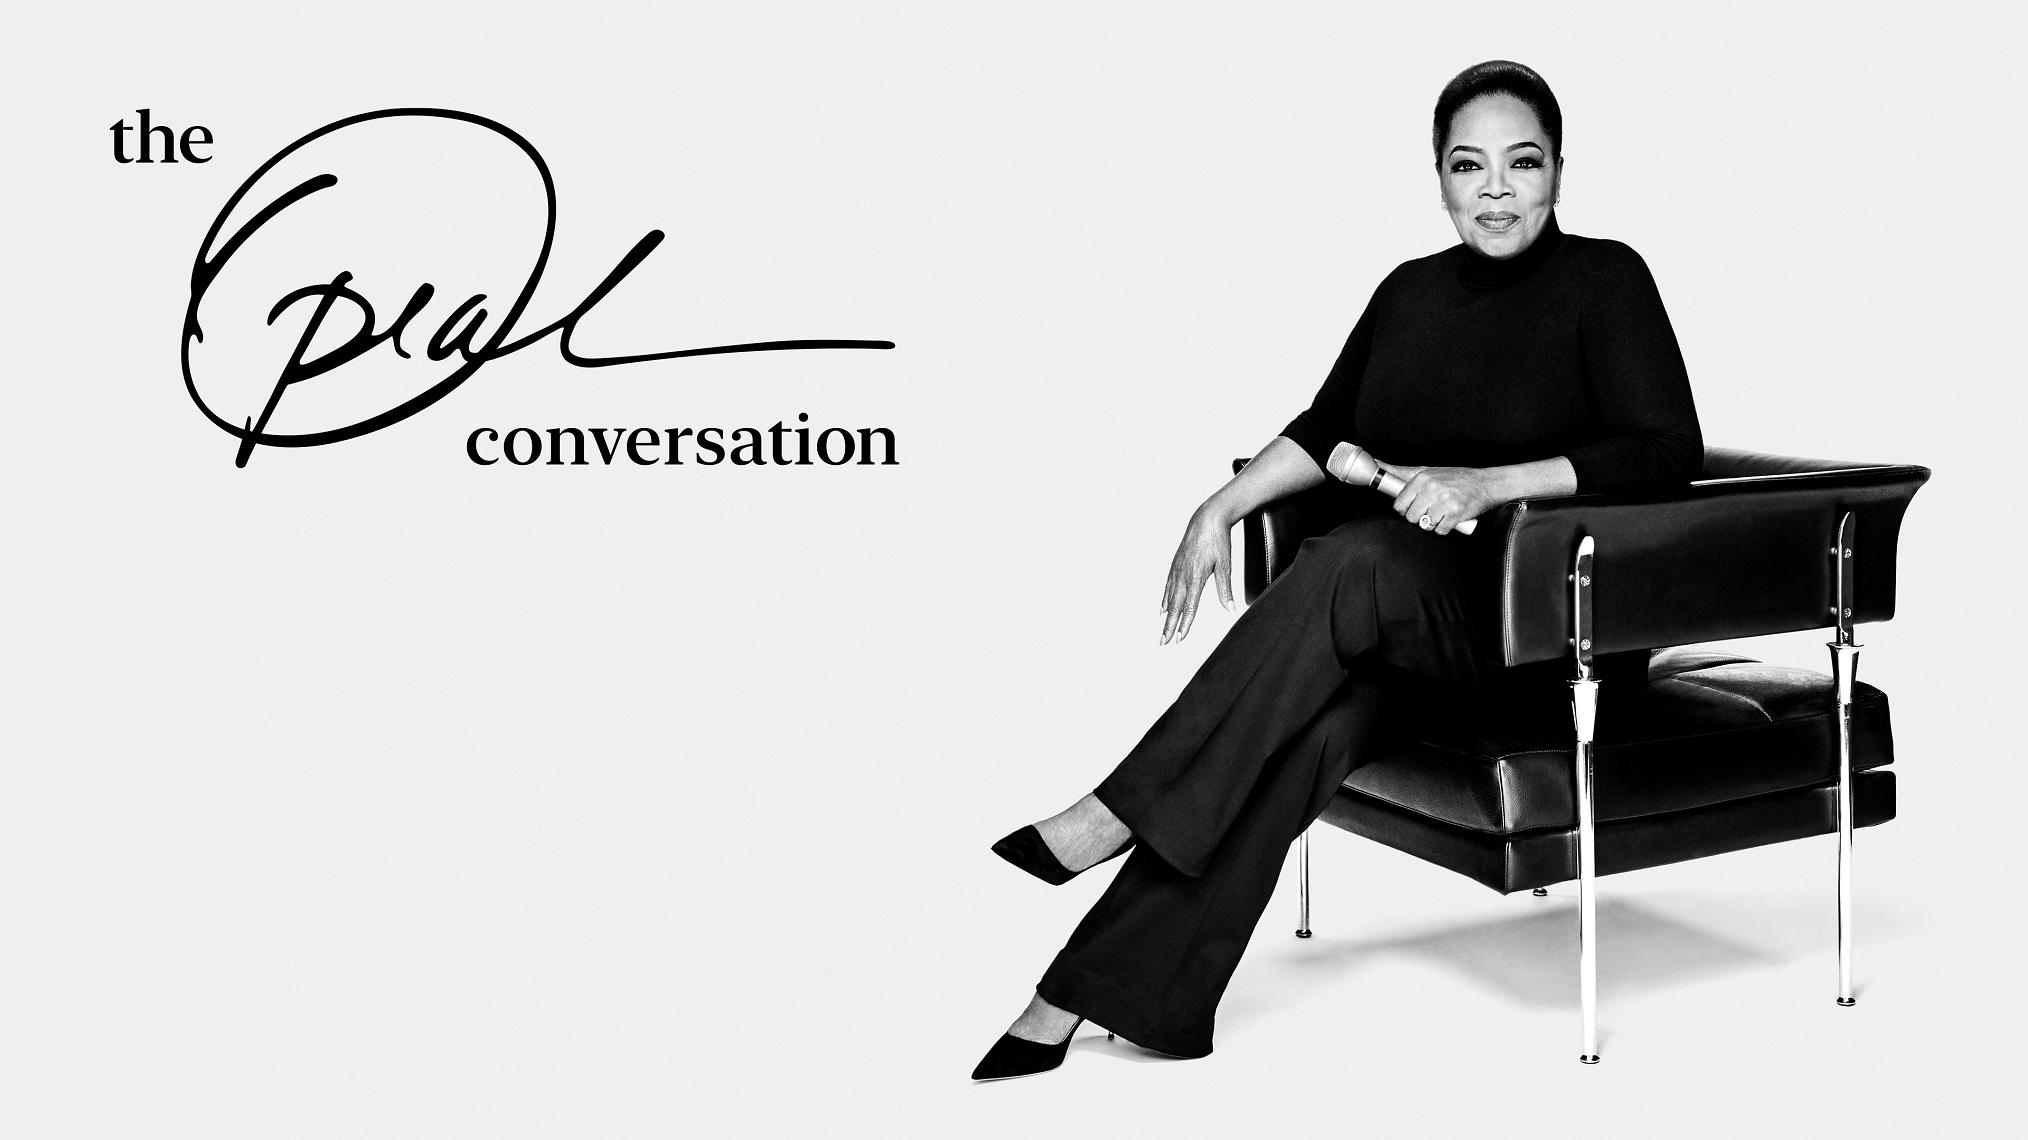 the oprah conversation 02